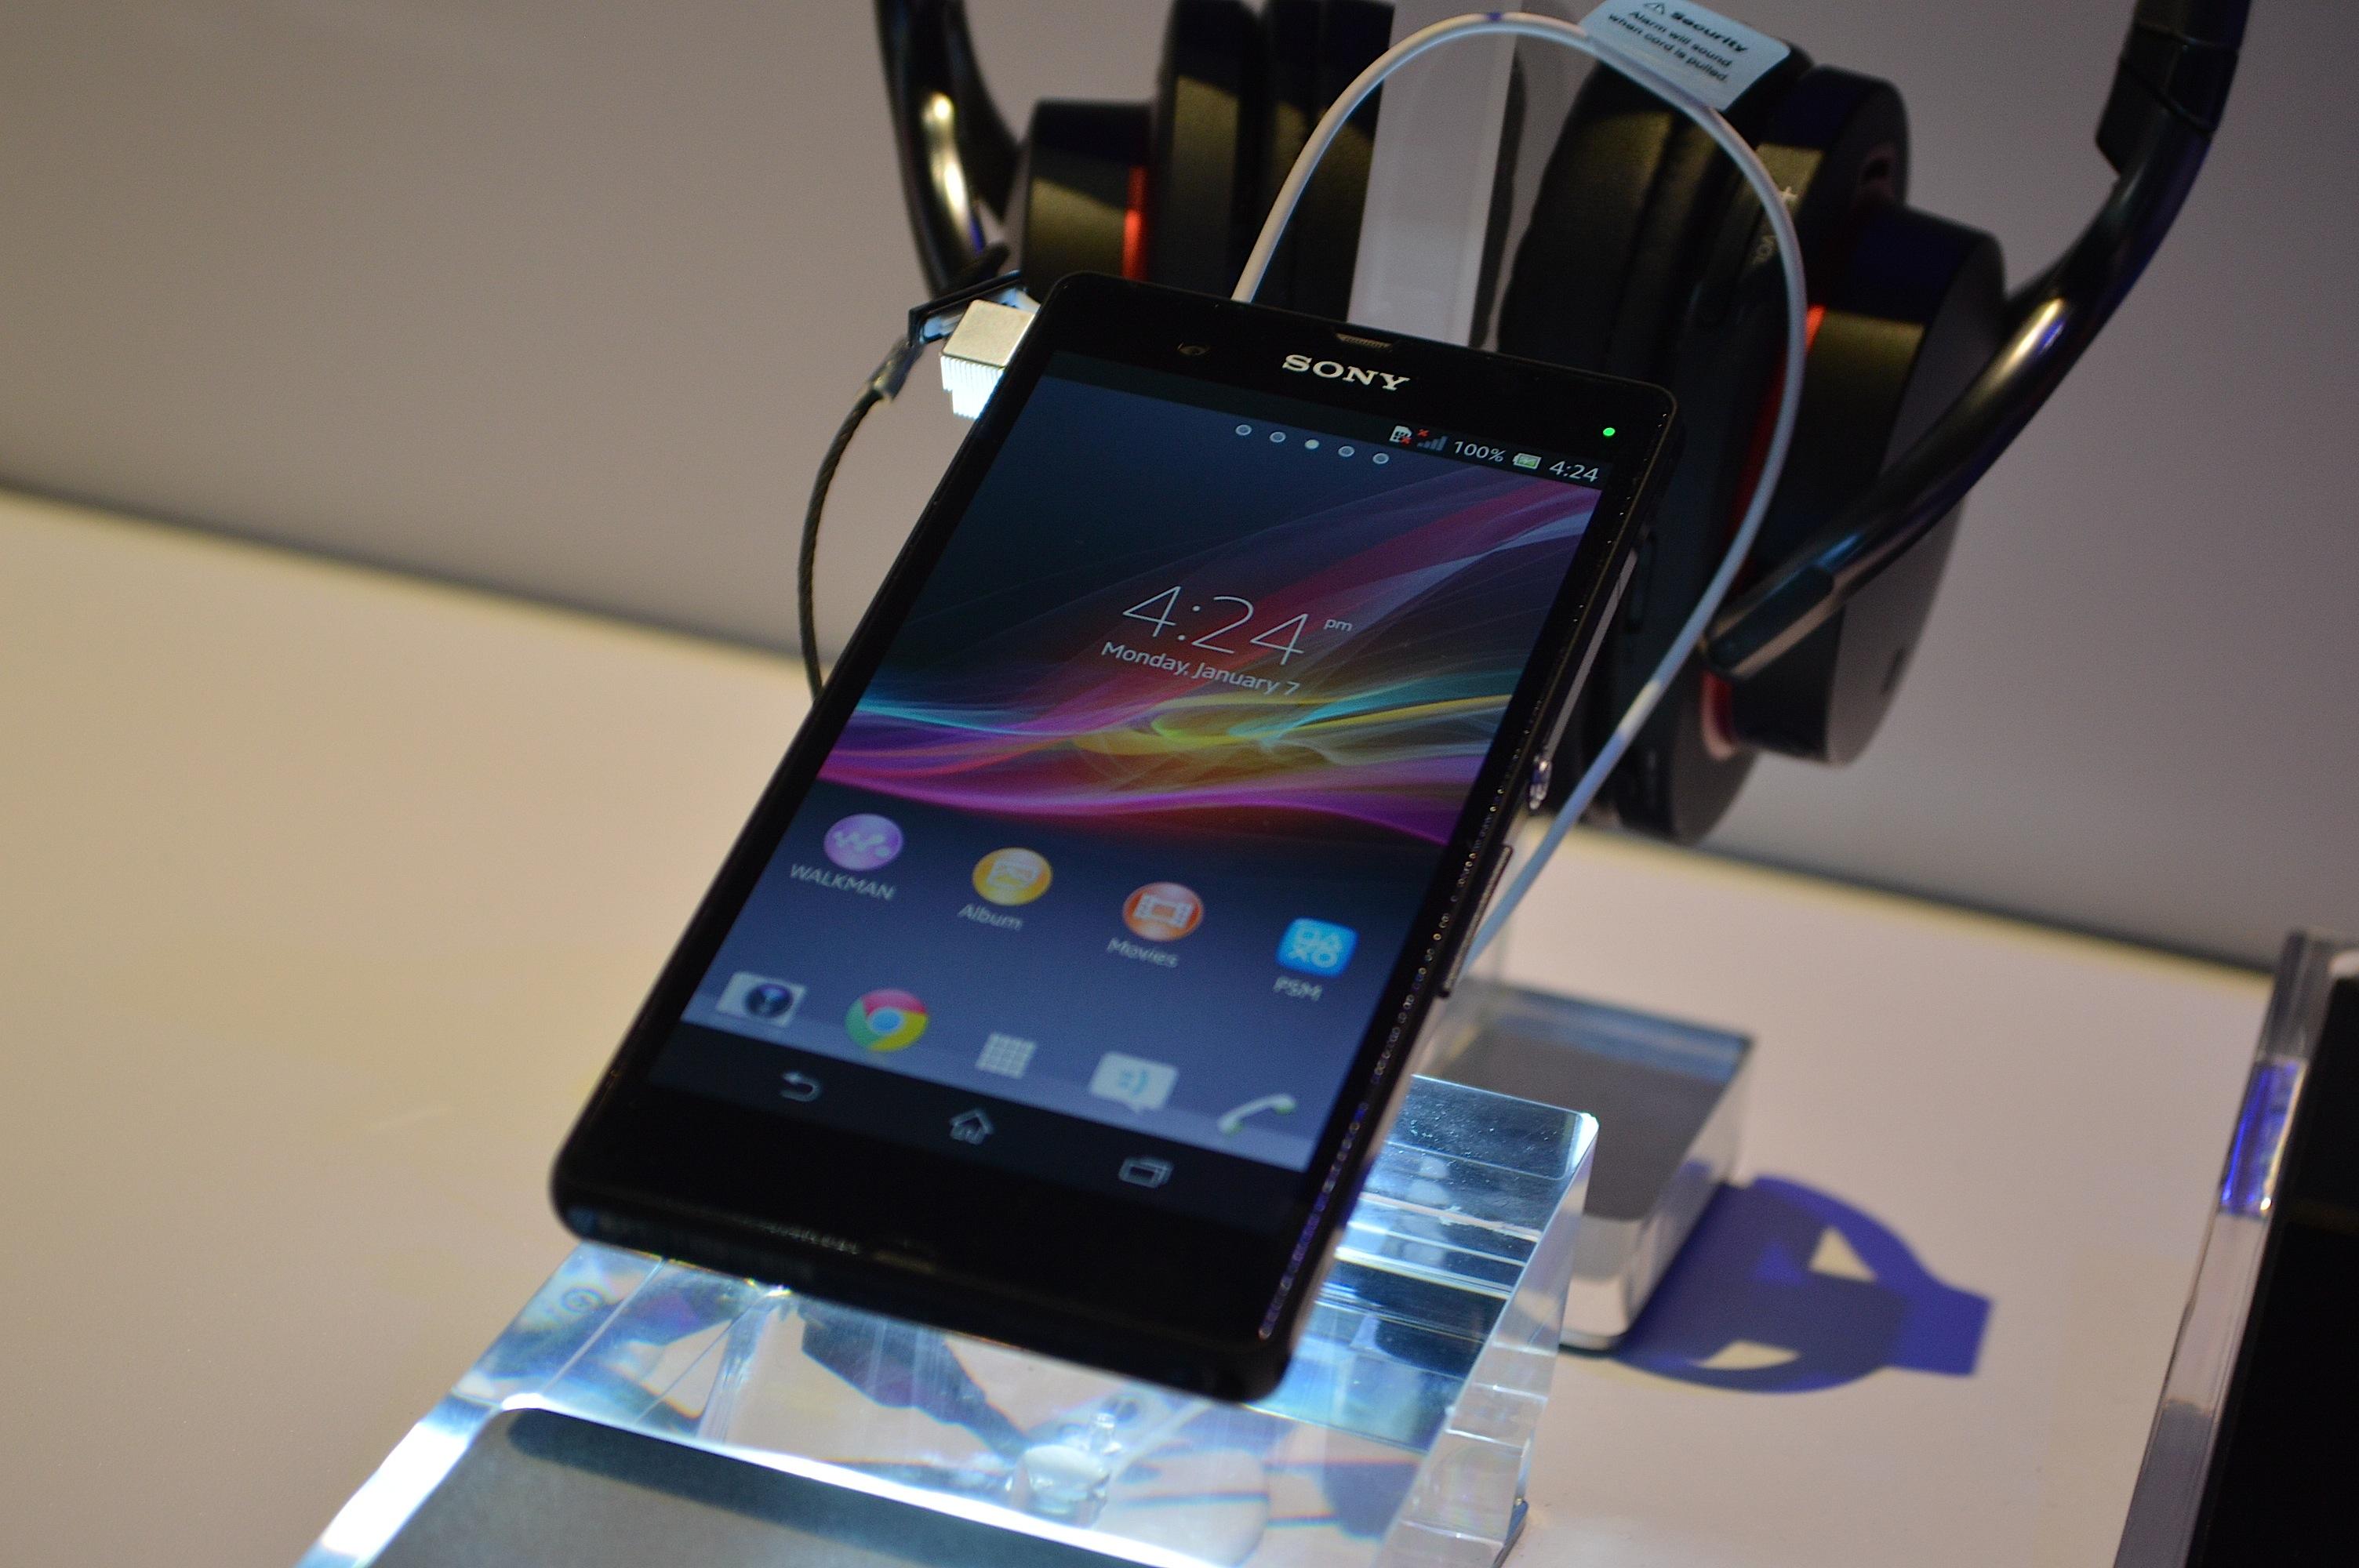 Sony Xperia Z CES 2013